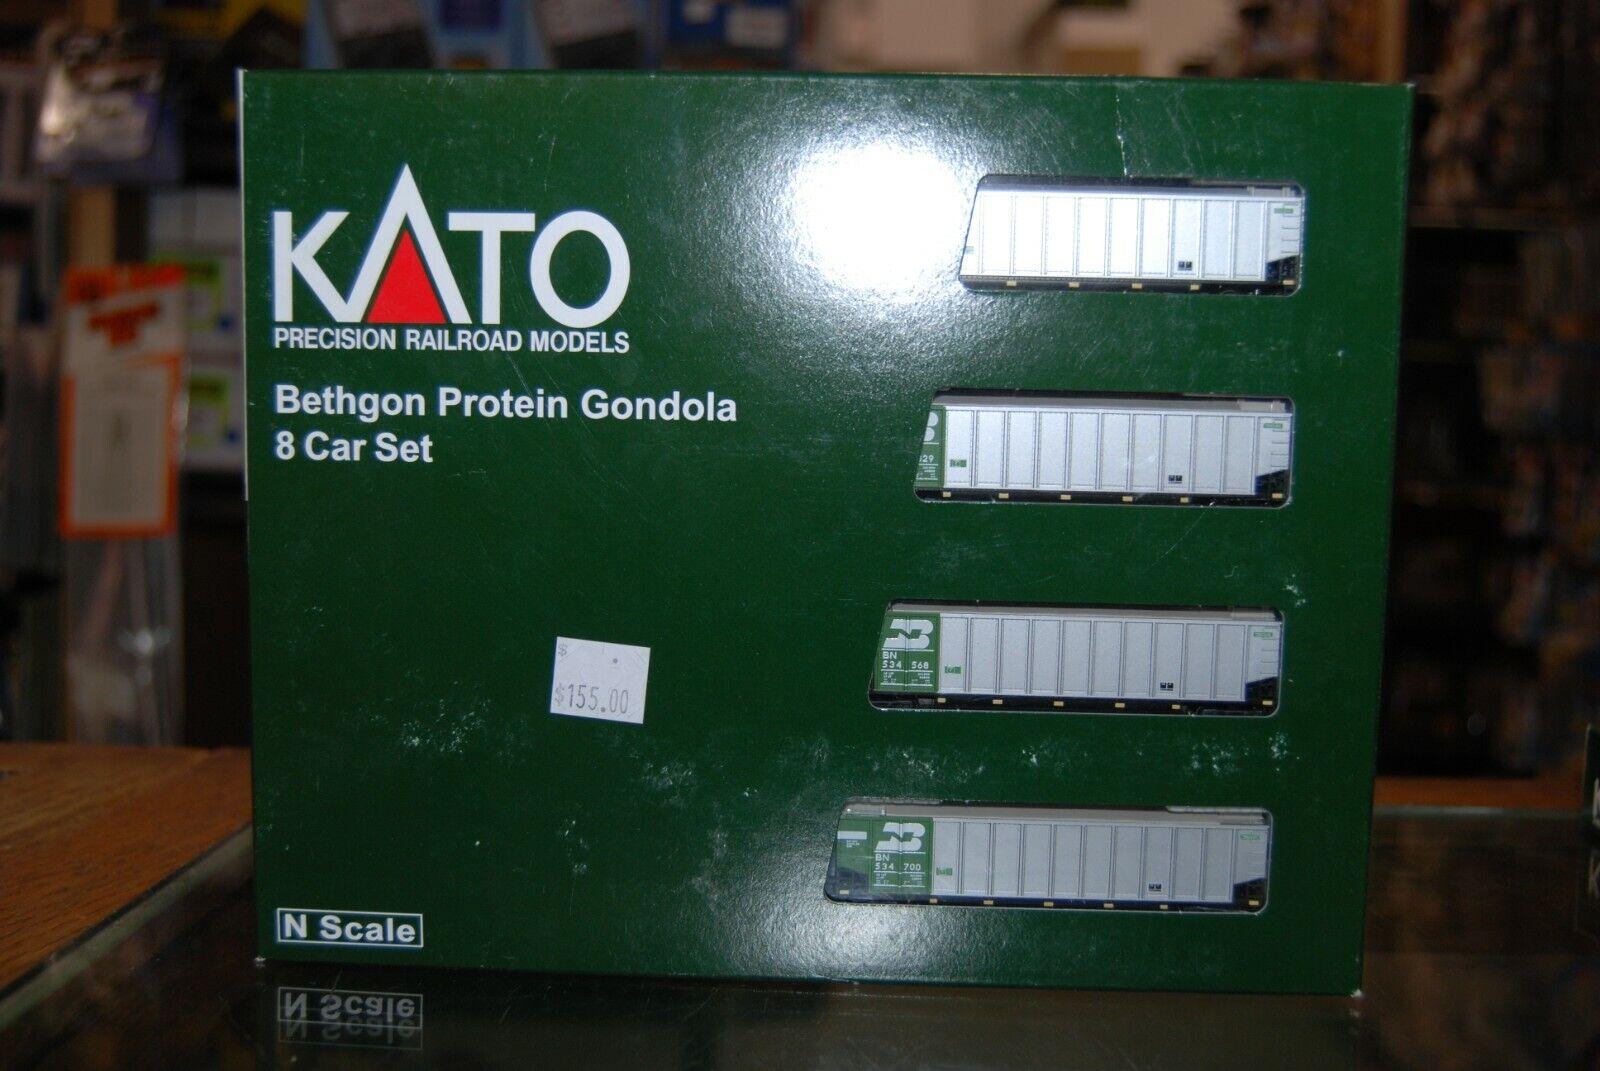 N skala Kato 106 -4651  Bethgon Prödein Gondola, BN Bil Set